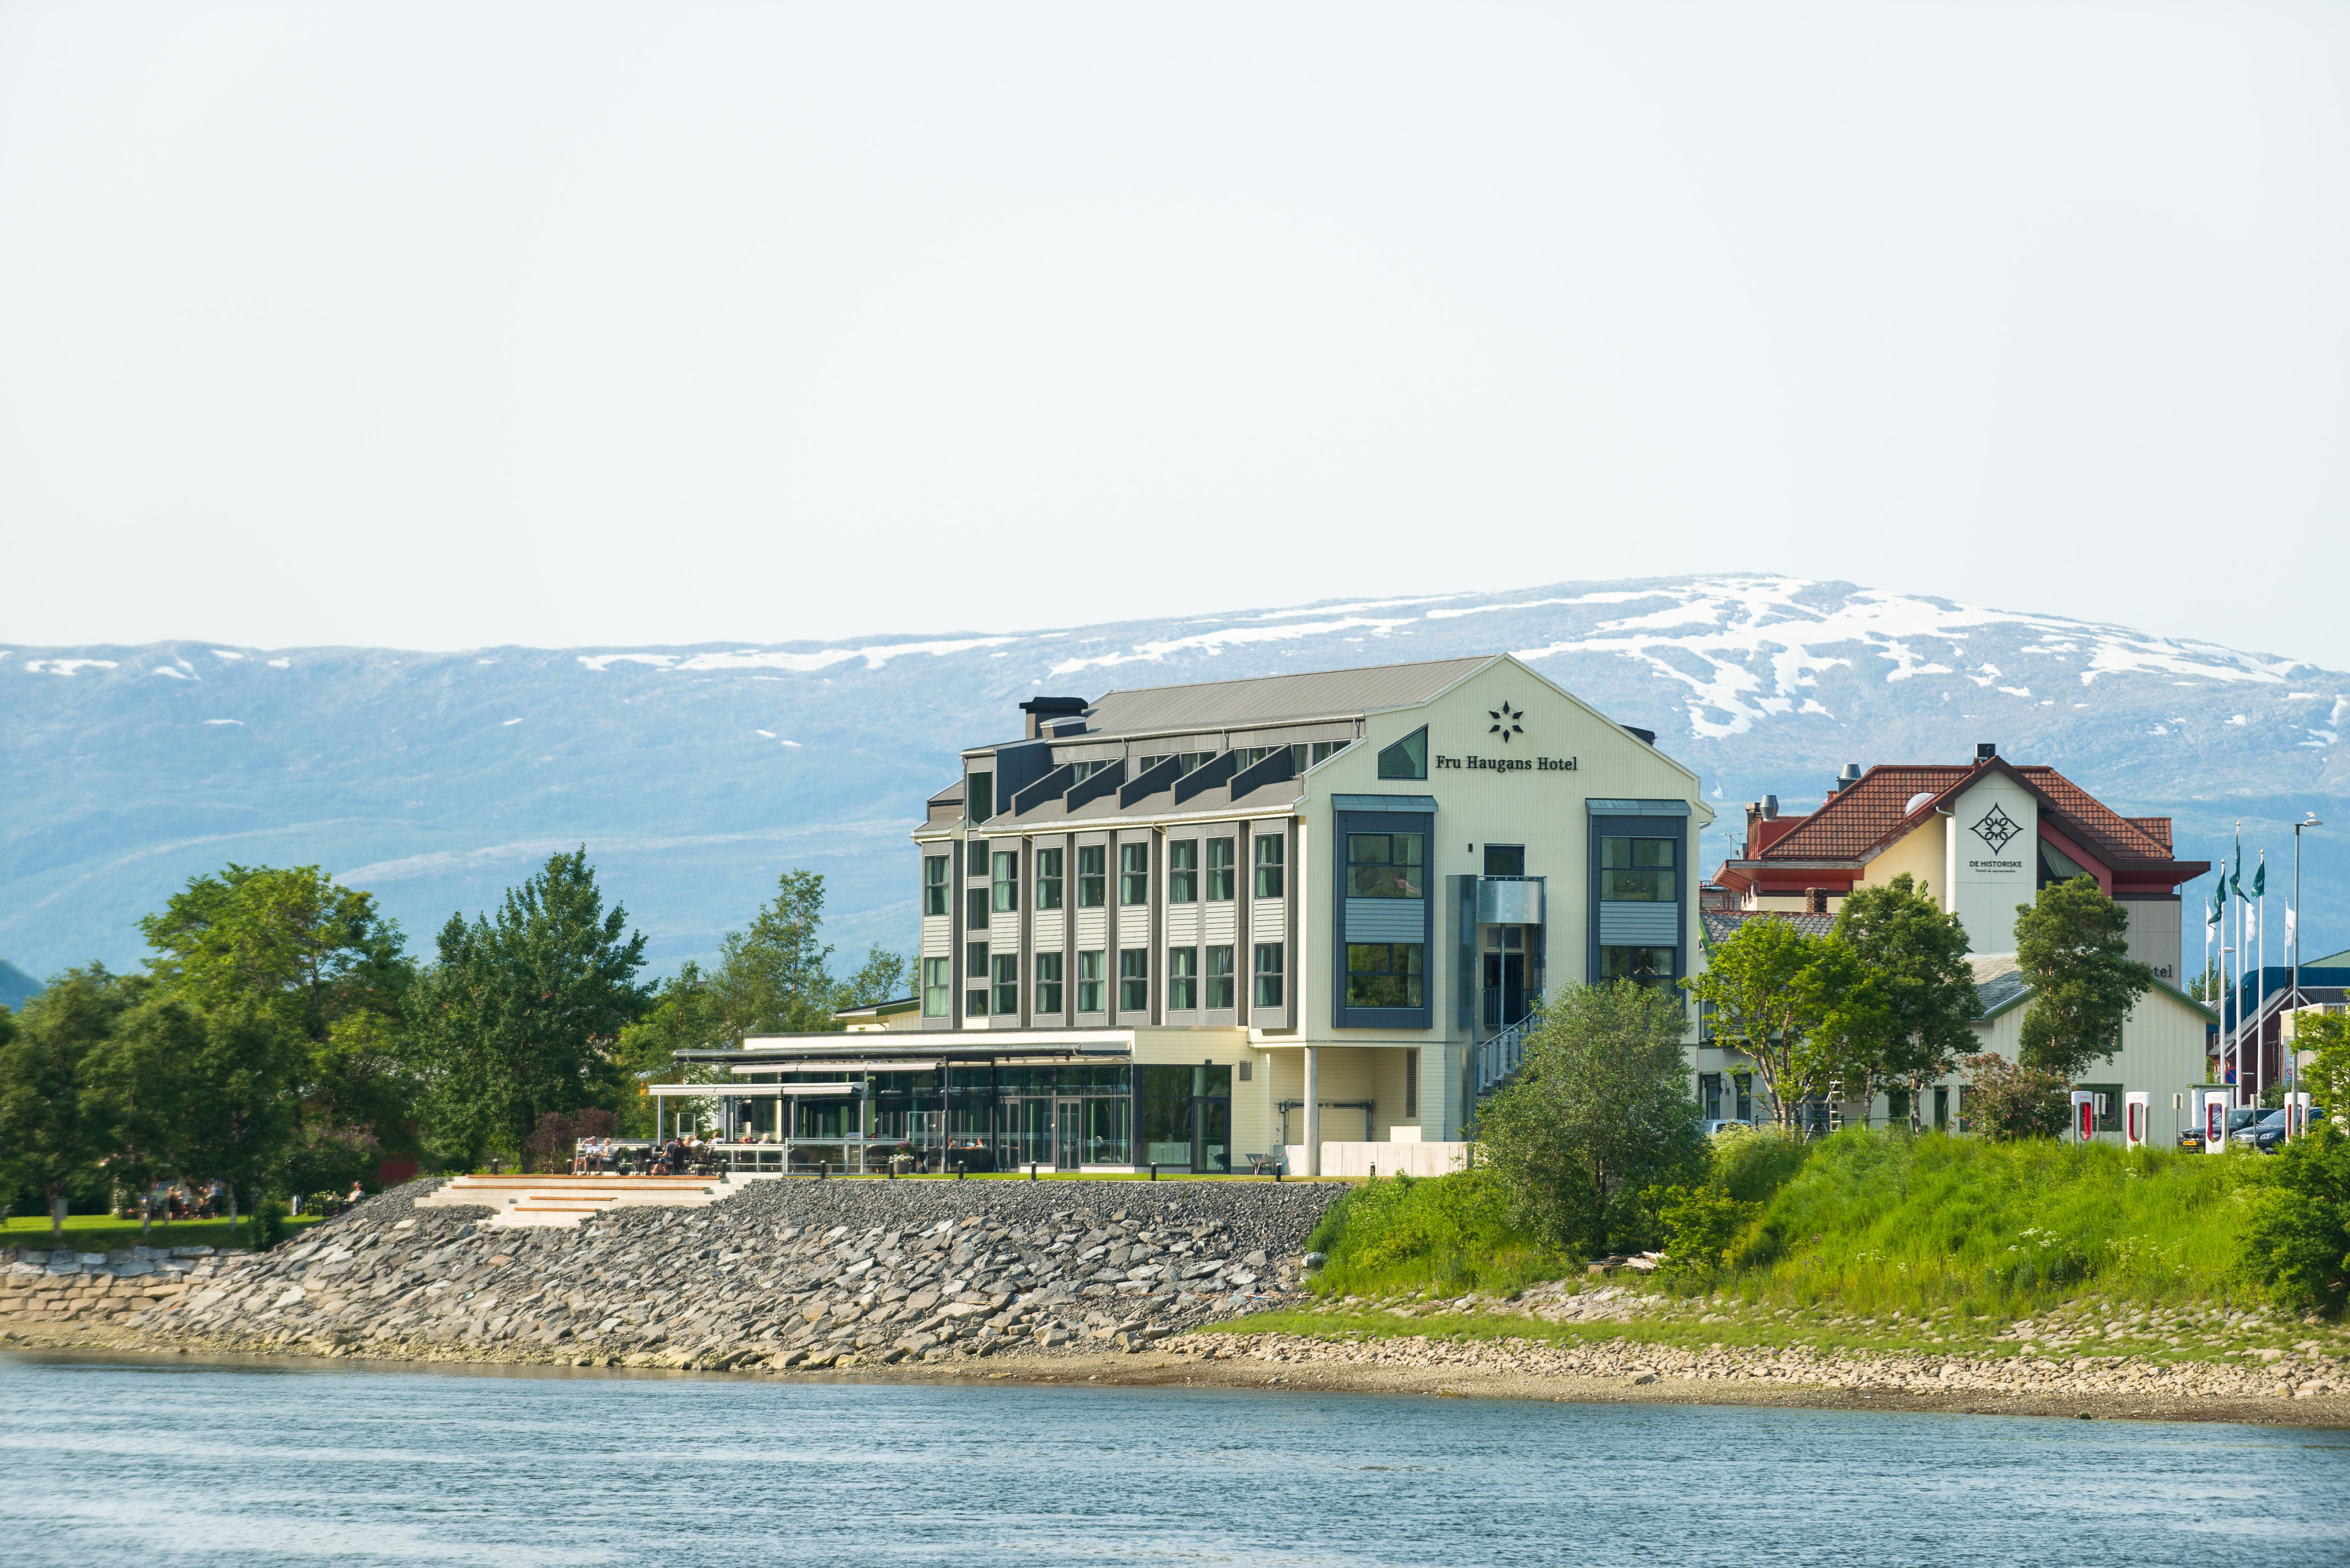 Fru Haugans Hotel,  © Fru Haugans Hotel, Guest Harbour, Fru Haugans Hotell Gjestehavn